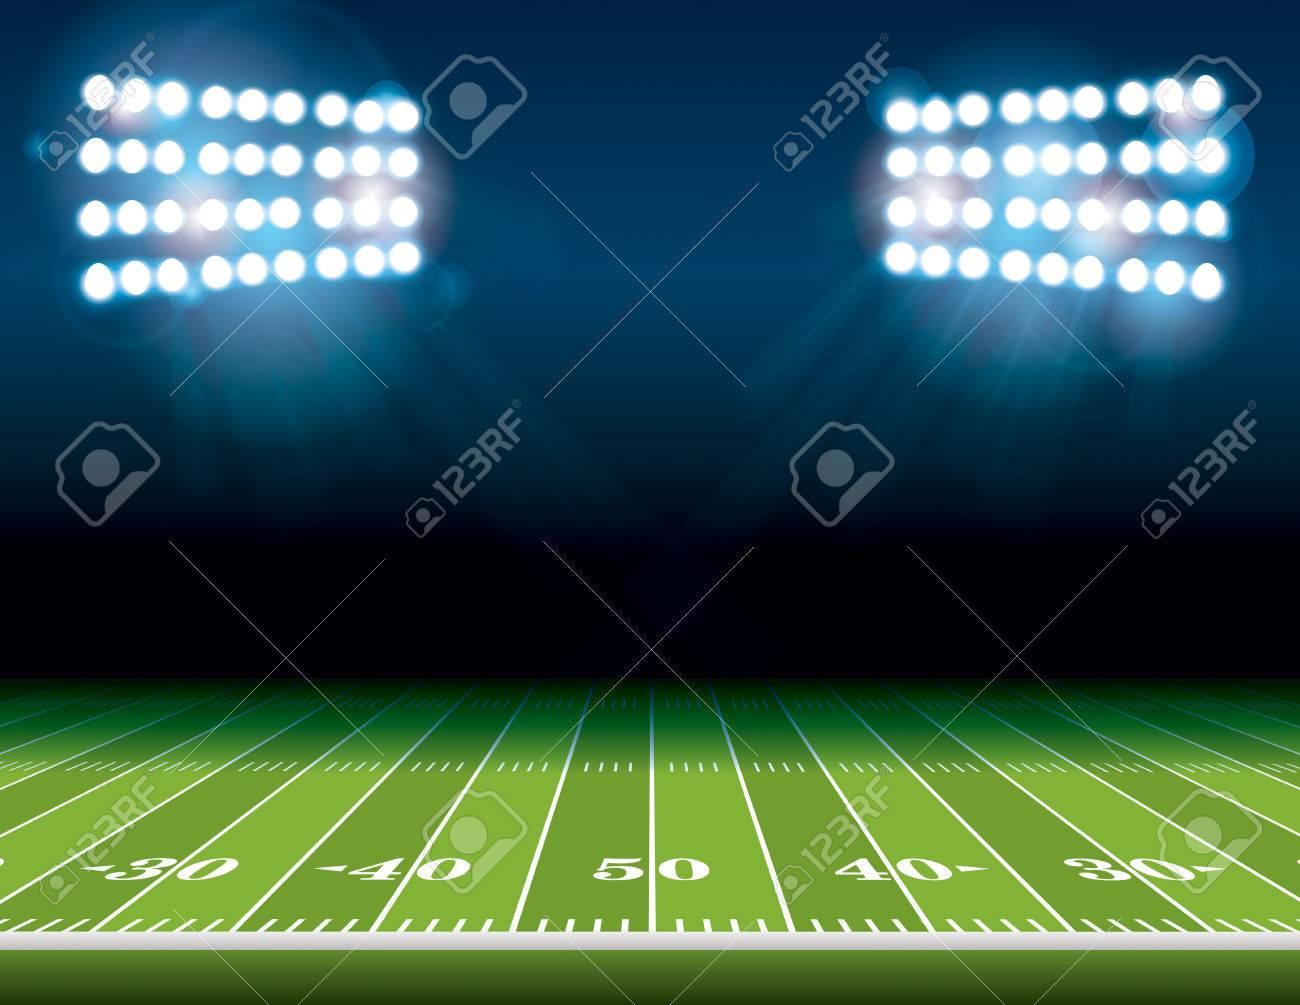 45 127 football field cliparts stock vector and royalty free rh 123rf com american football field clipart football field clipart images